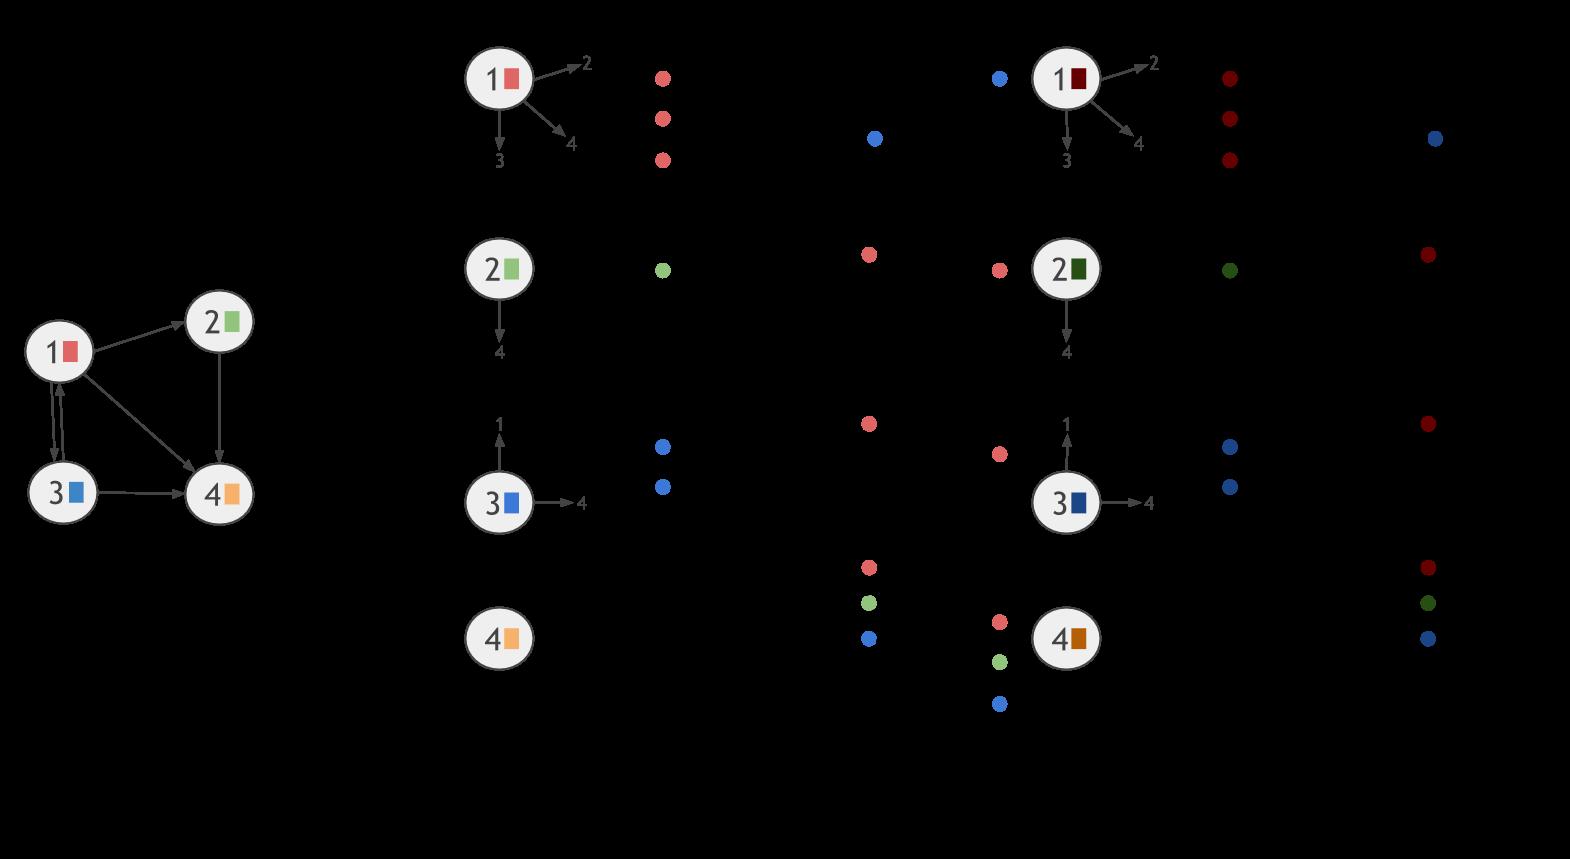 Apache Flink 15 Documentation Iterative Graph Processing Msg 3 Logic Diagram Vertex Centric Computational Model